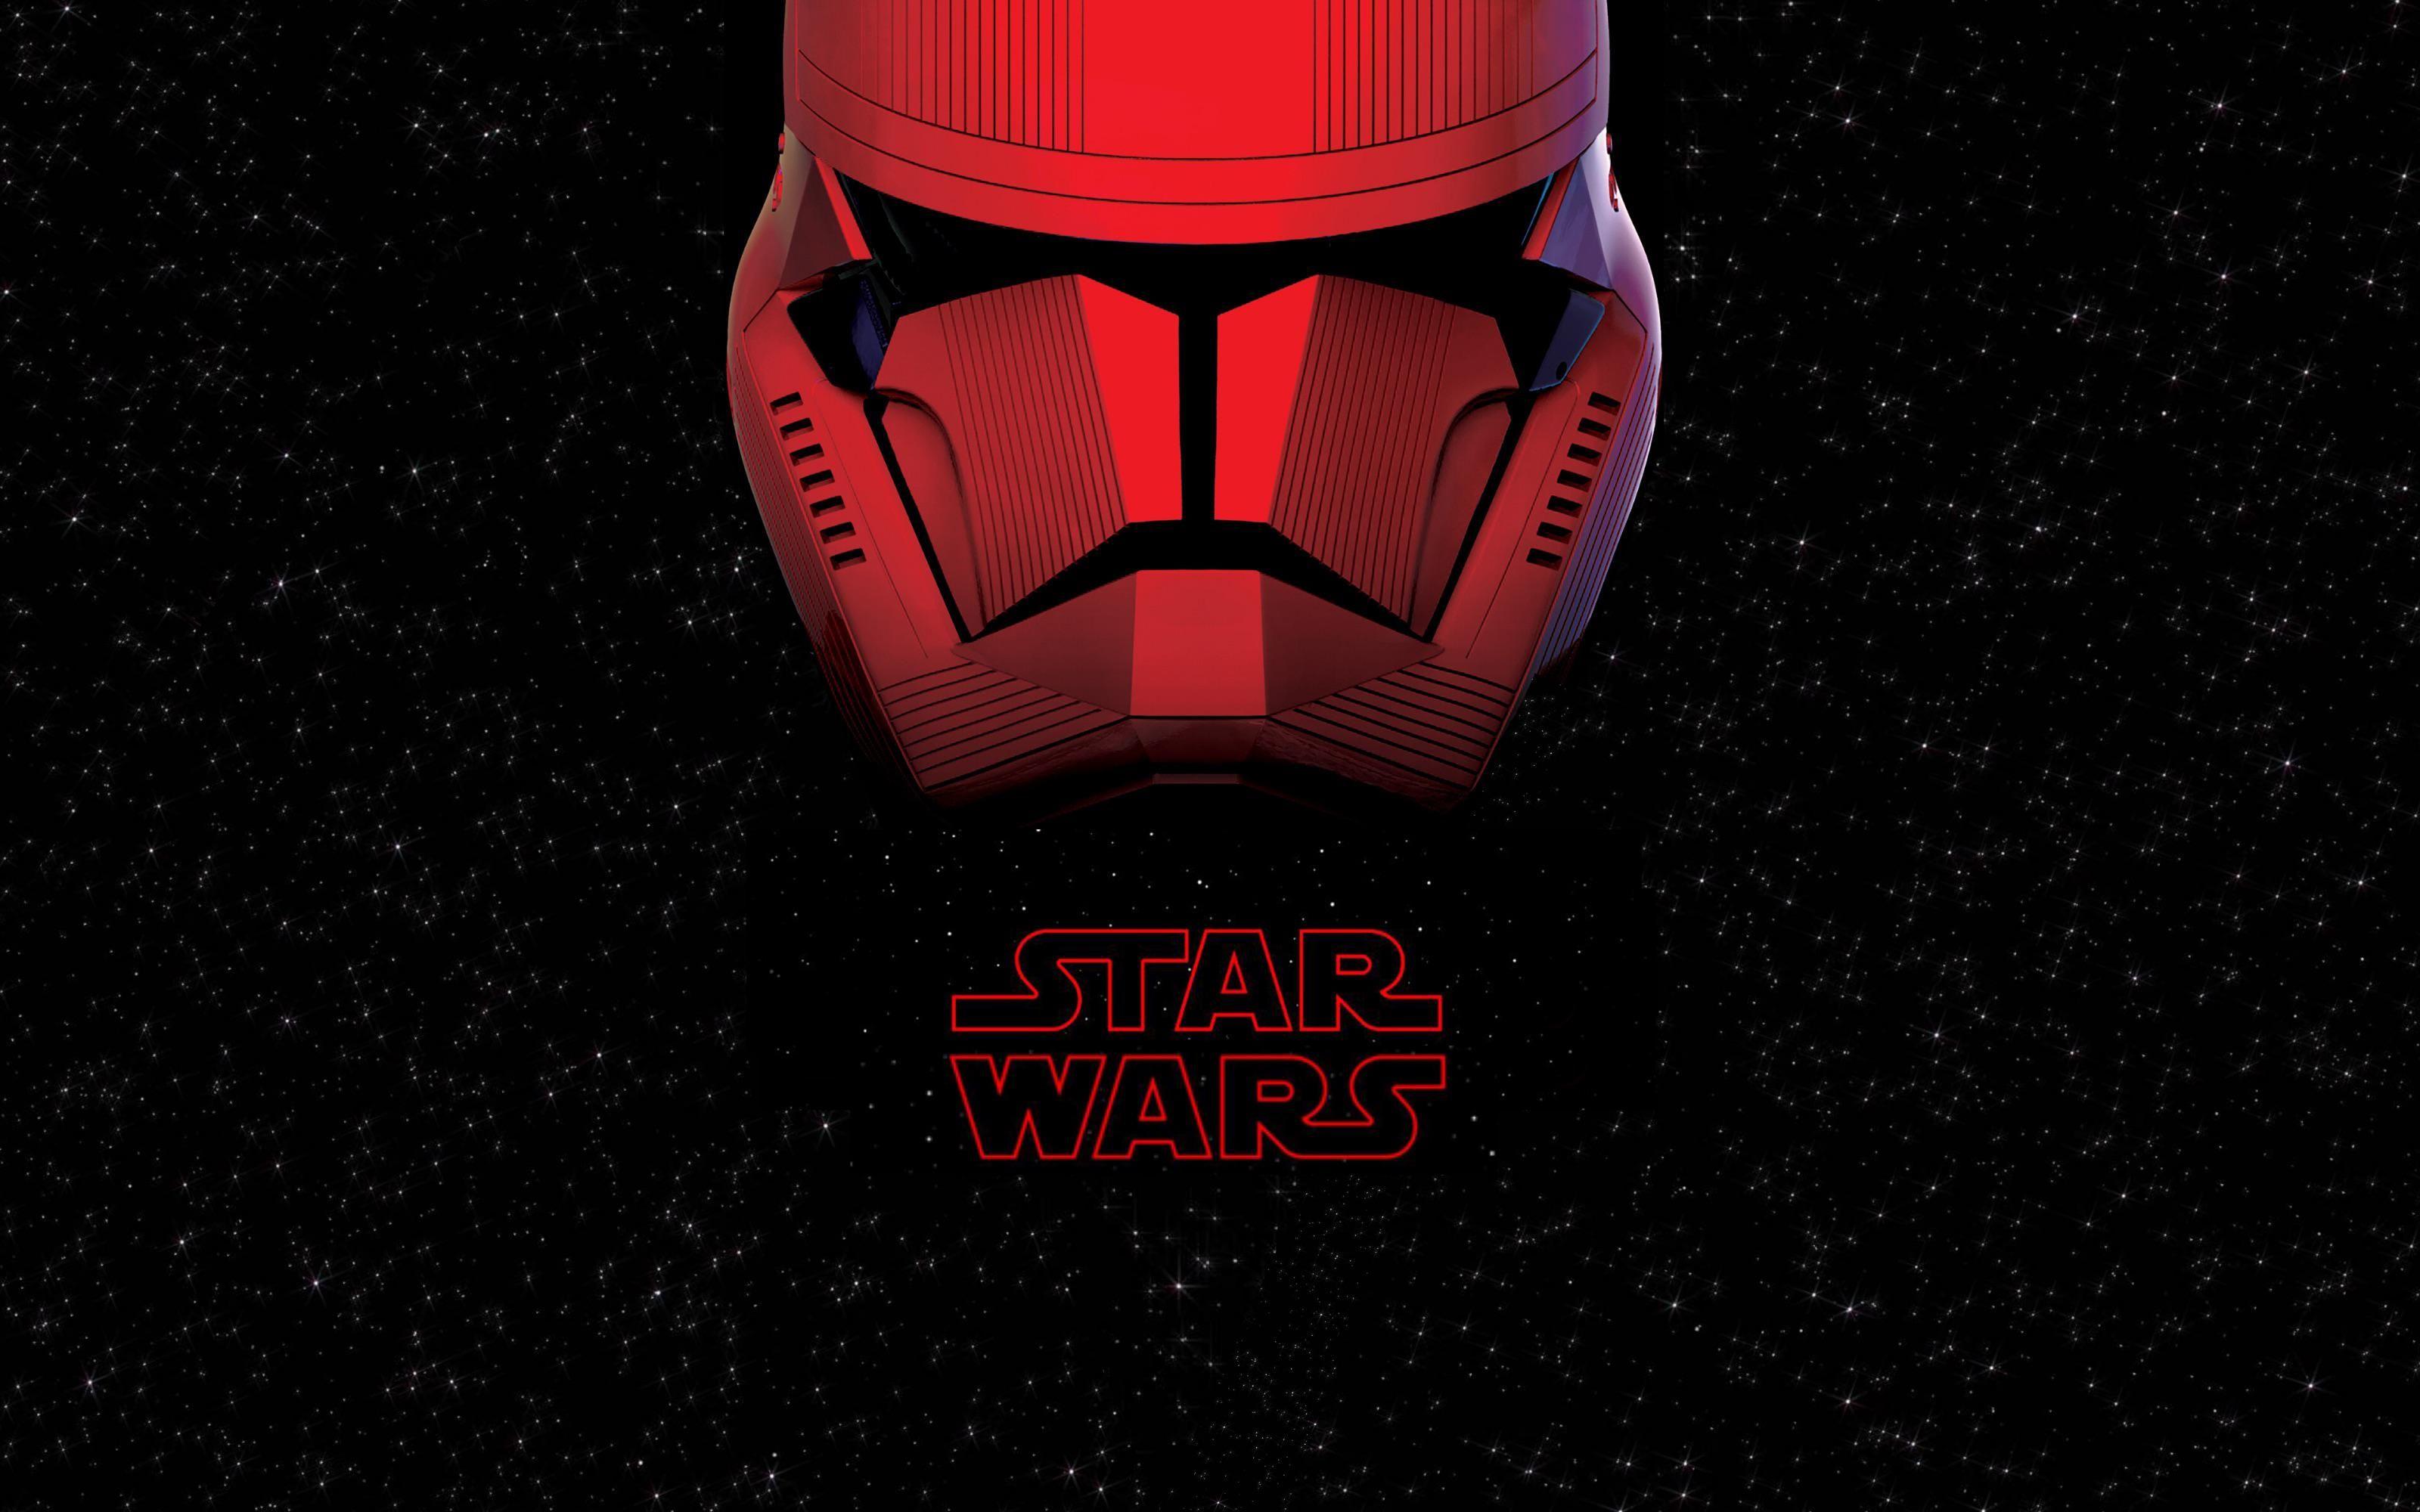 Elegant Star Wars Screensavers For Windows 10 Star Wars Wallpaper Star Wars Background Star Wars Illustration